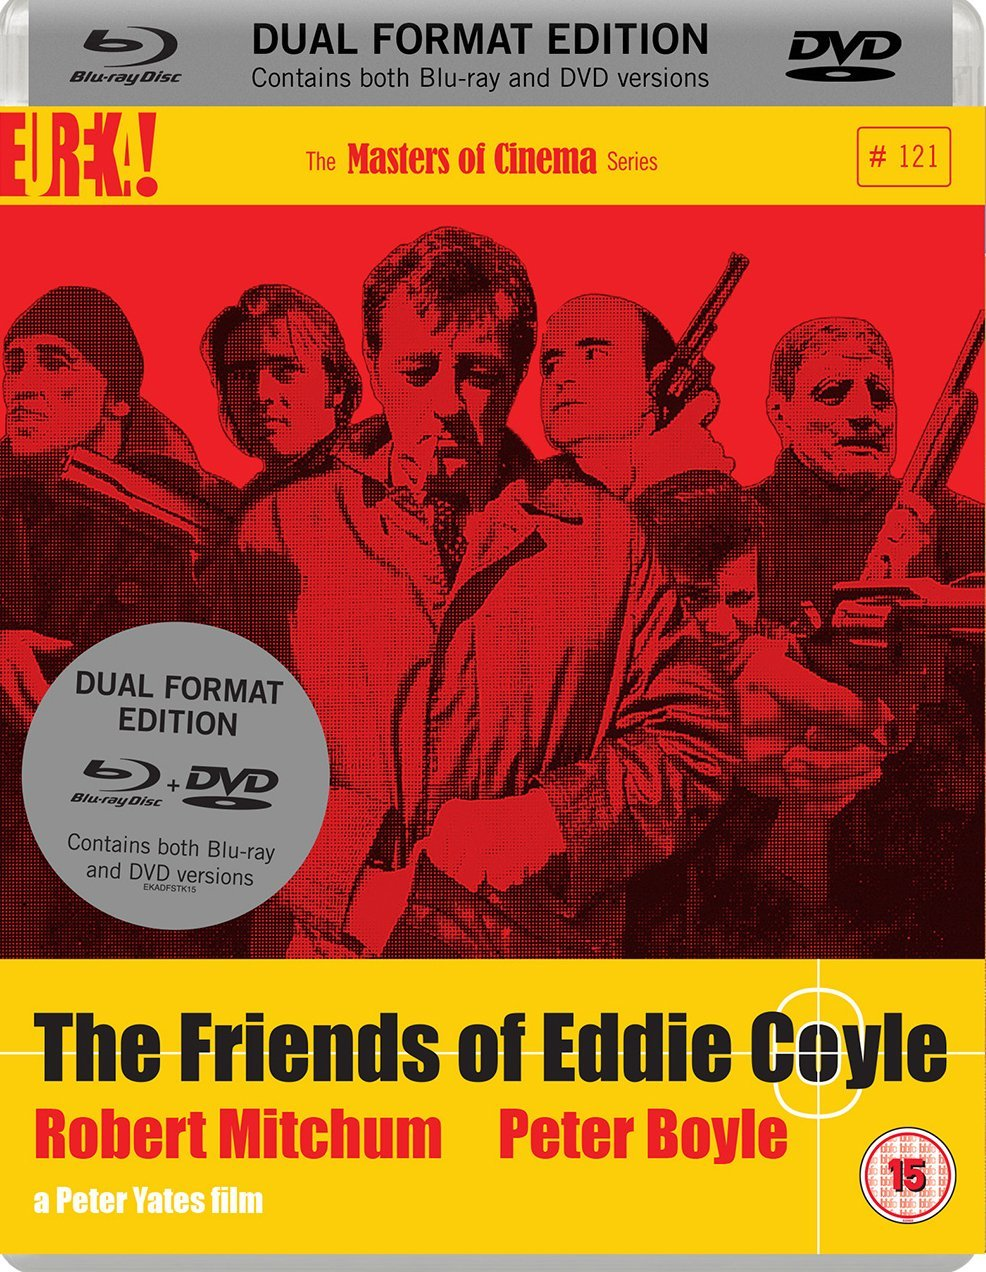 coyle-dvd.jpg